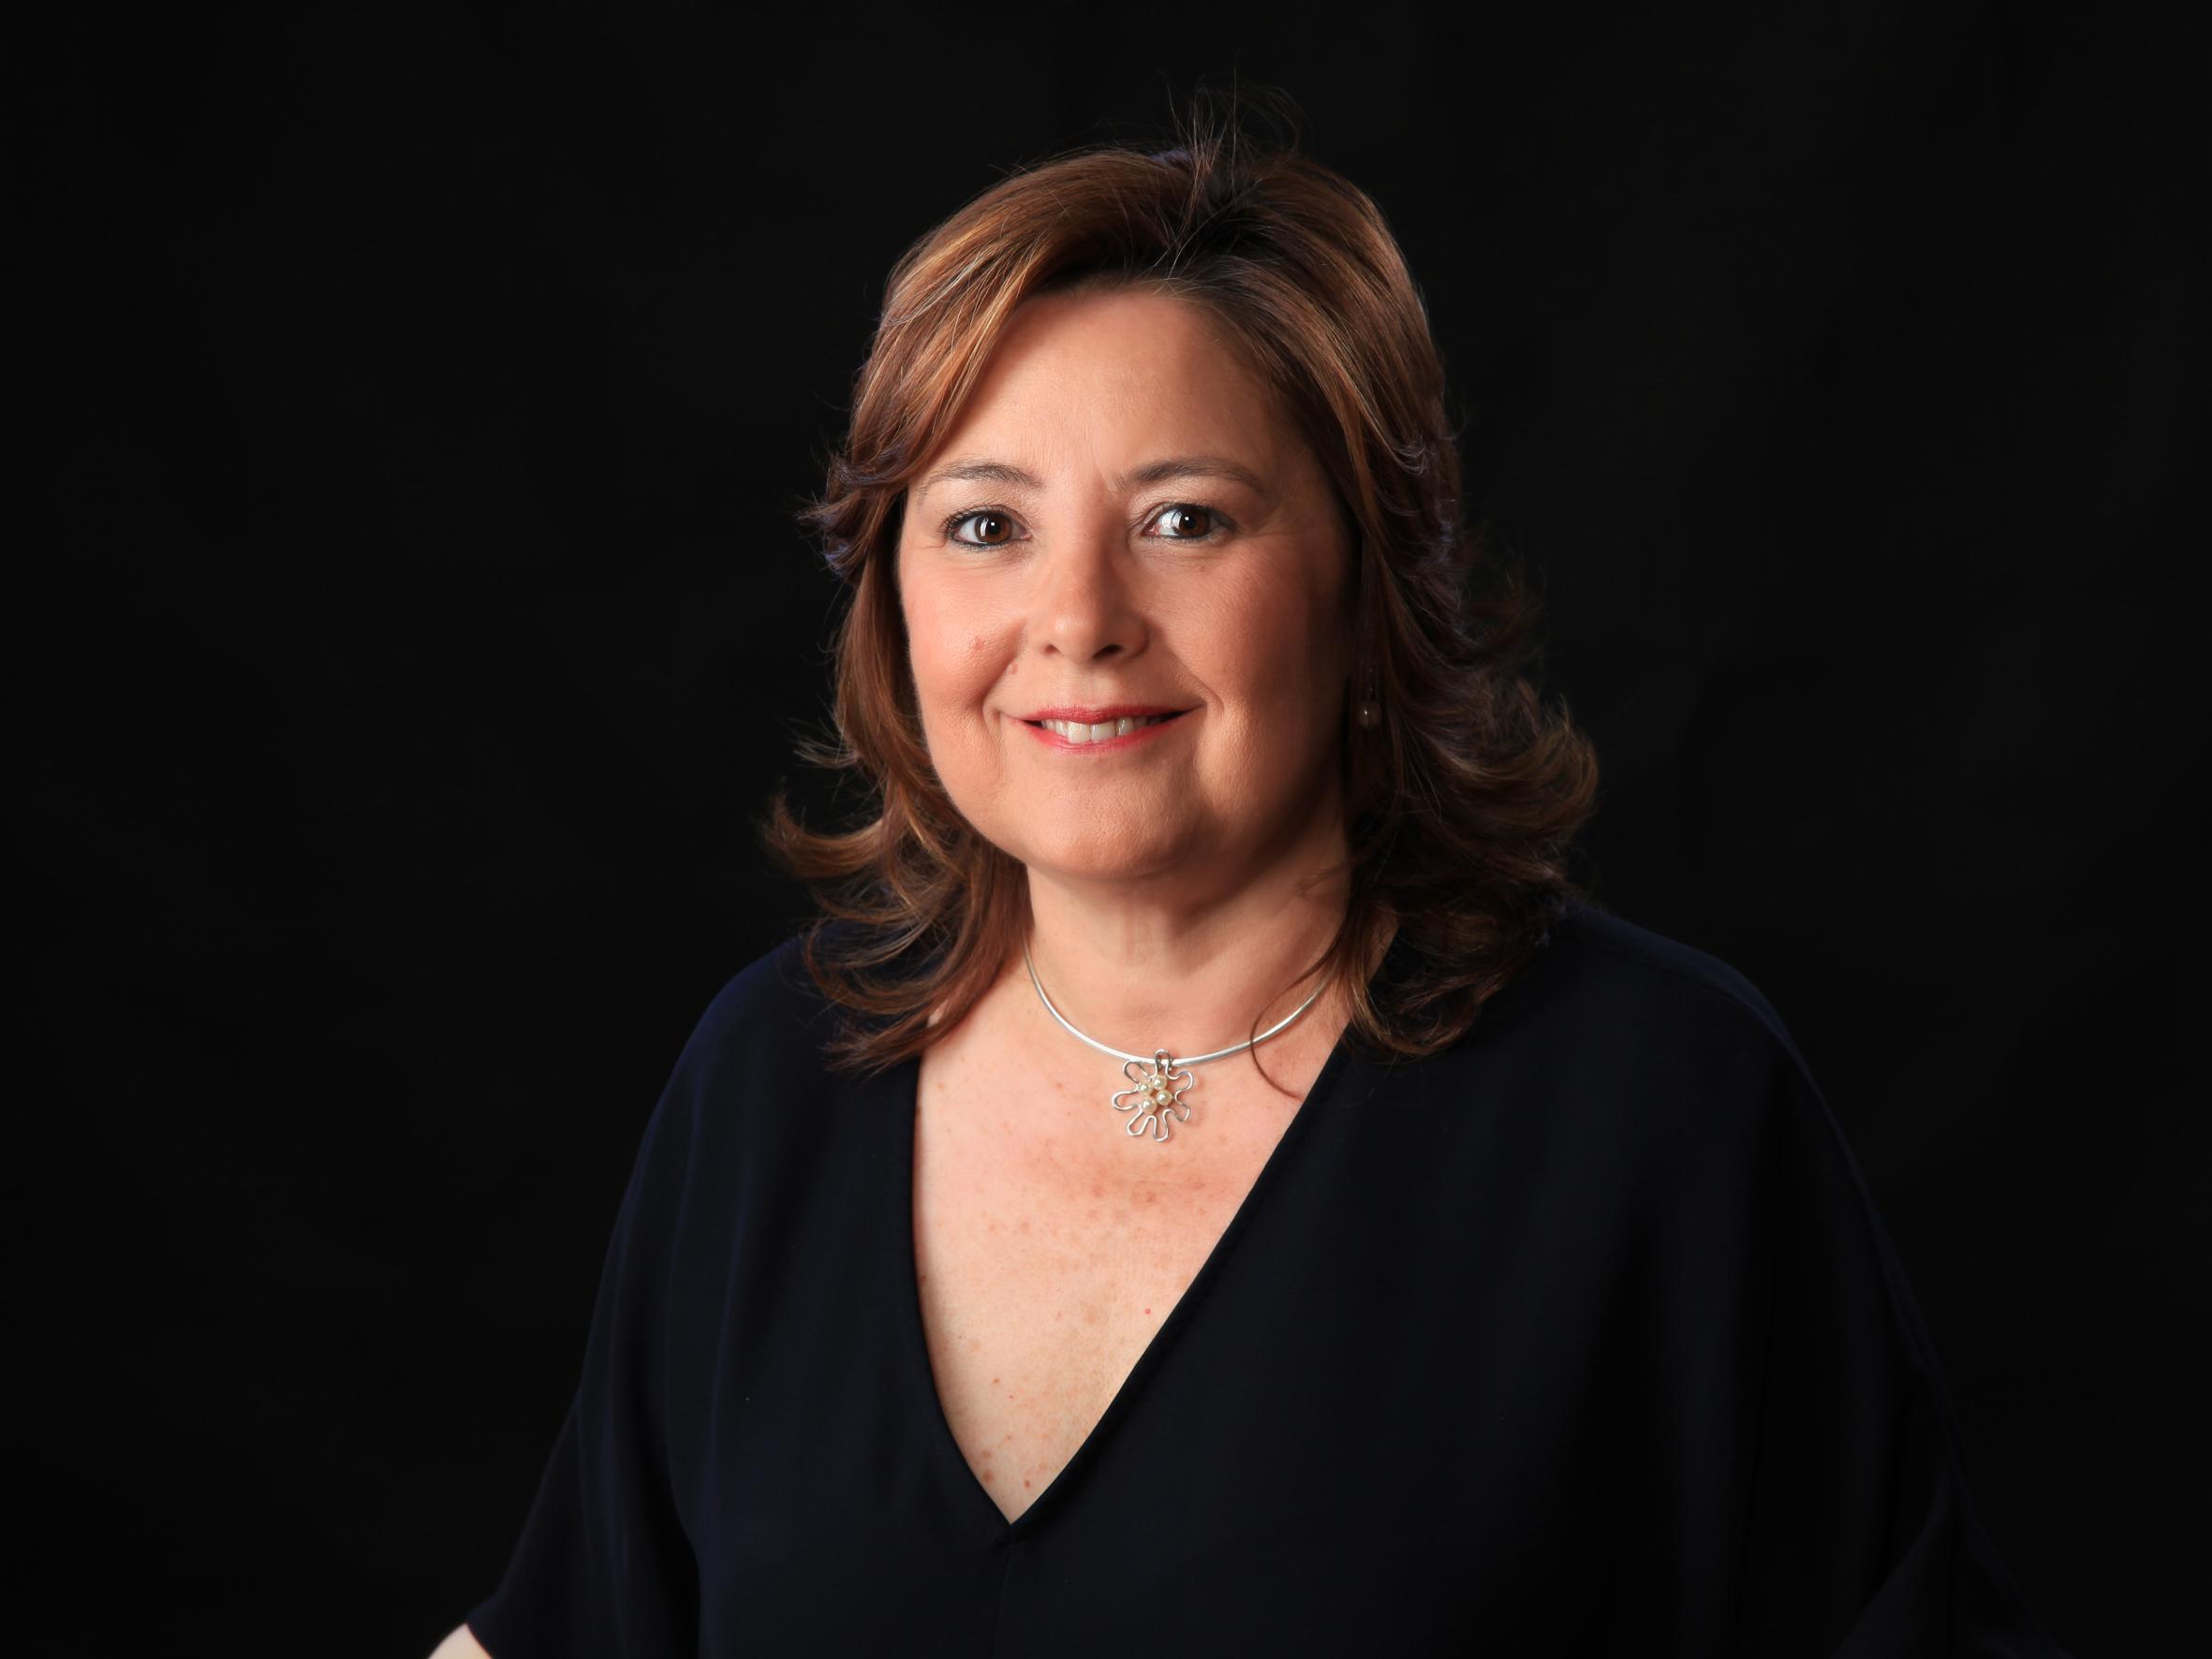 Inma Pérez